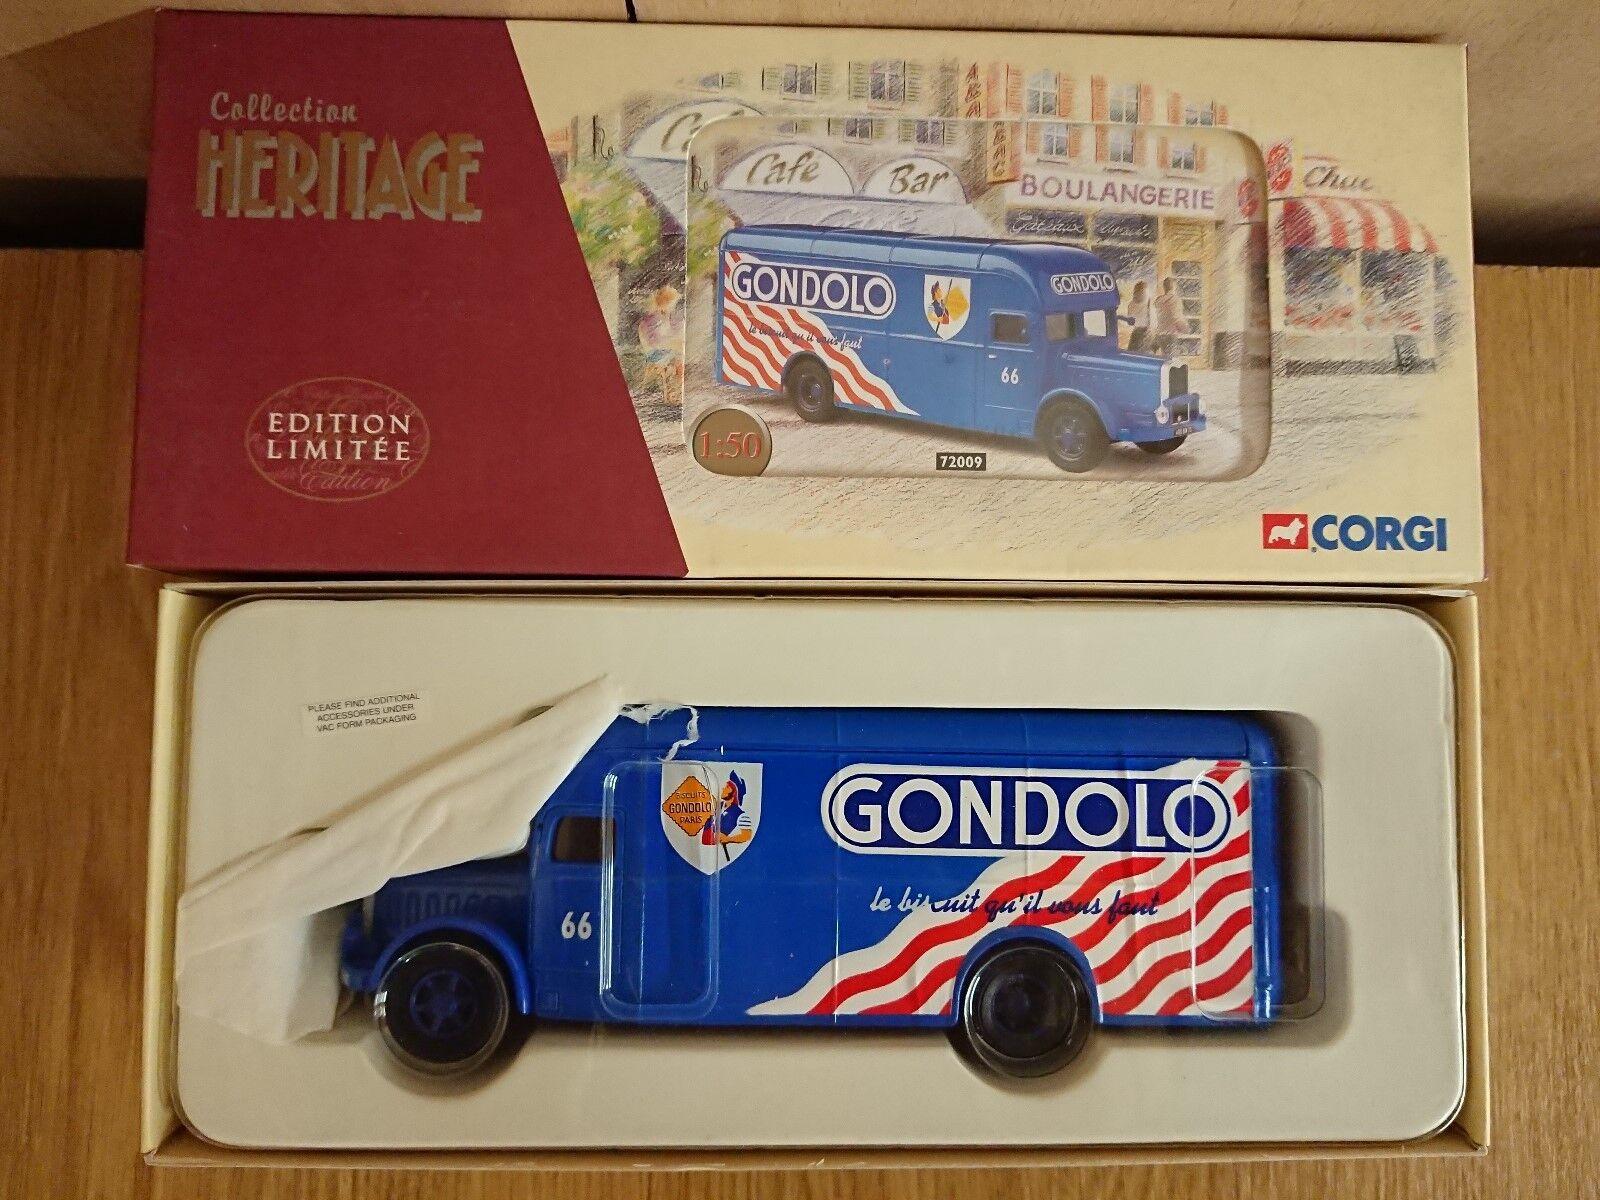 Corgi 72009 Bernard Type 110 Fourgon GONDOLO Ltd Ed No. 0026 of ONLY 1048